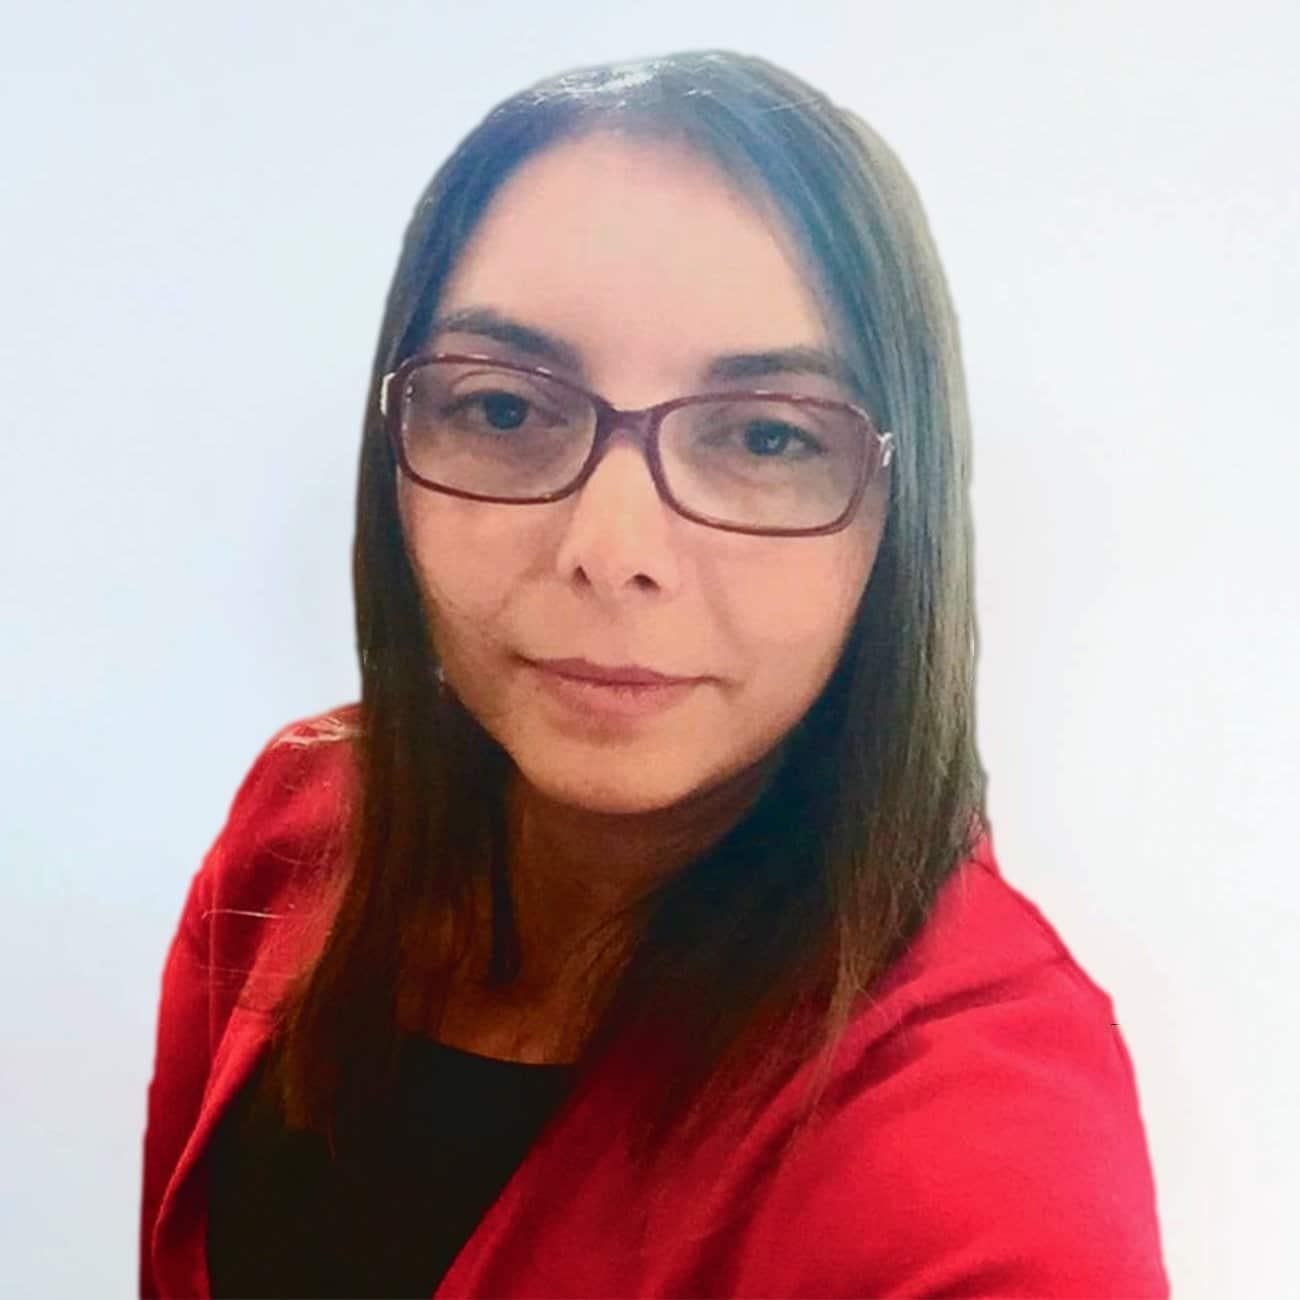 Evelyn Garrido